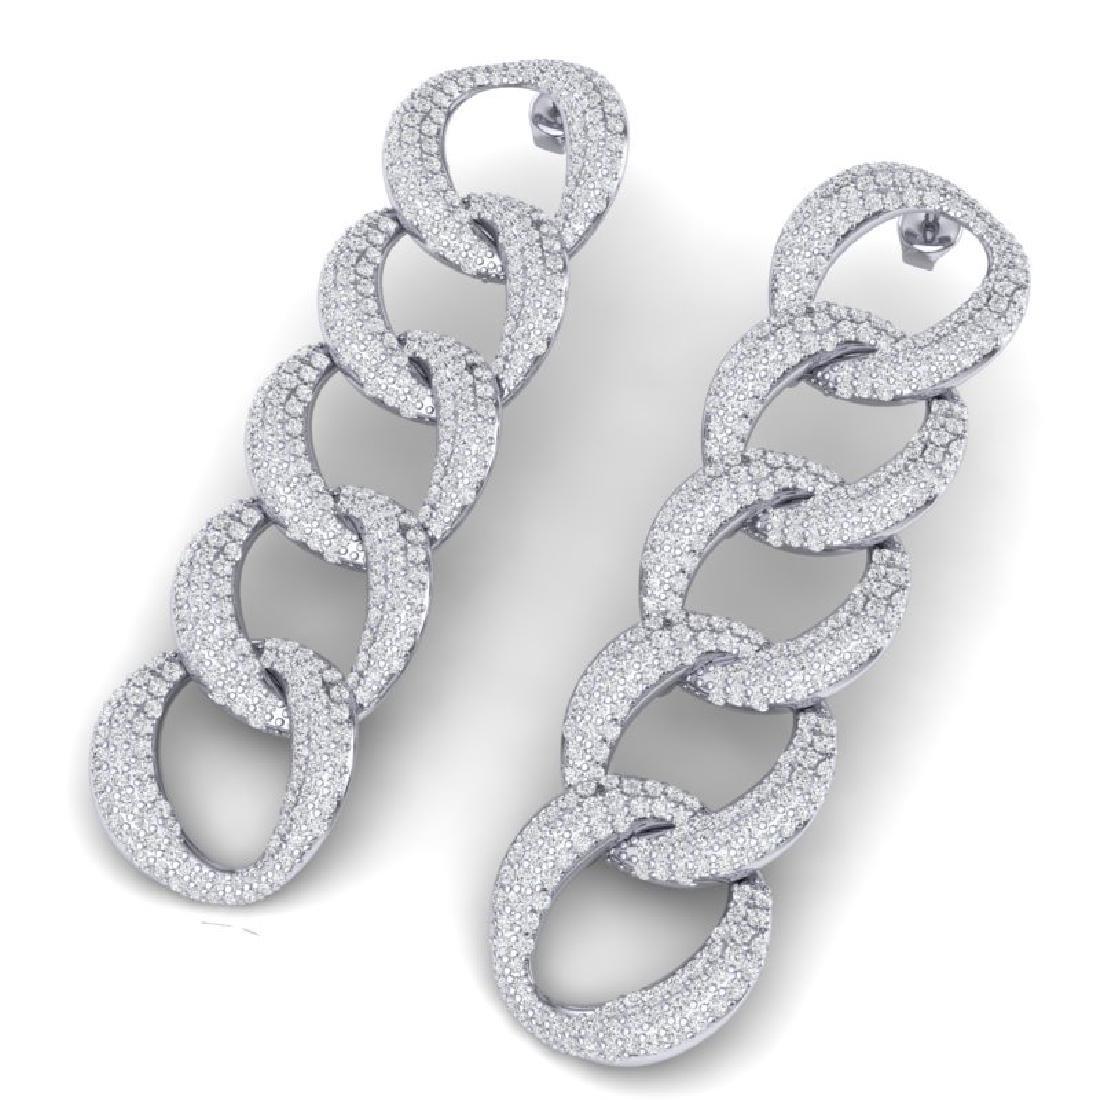 5 CTW Certified VS/SI Diamond Earrings 18K White Gold